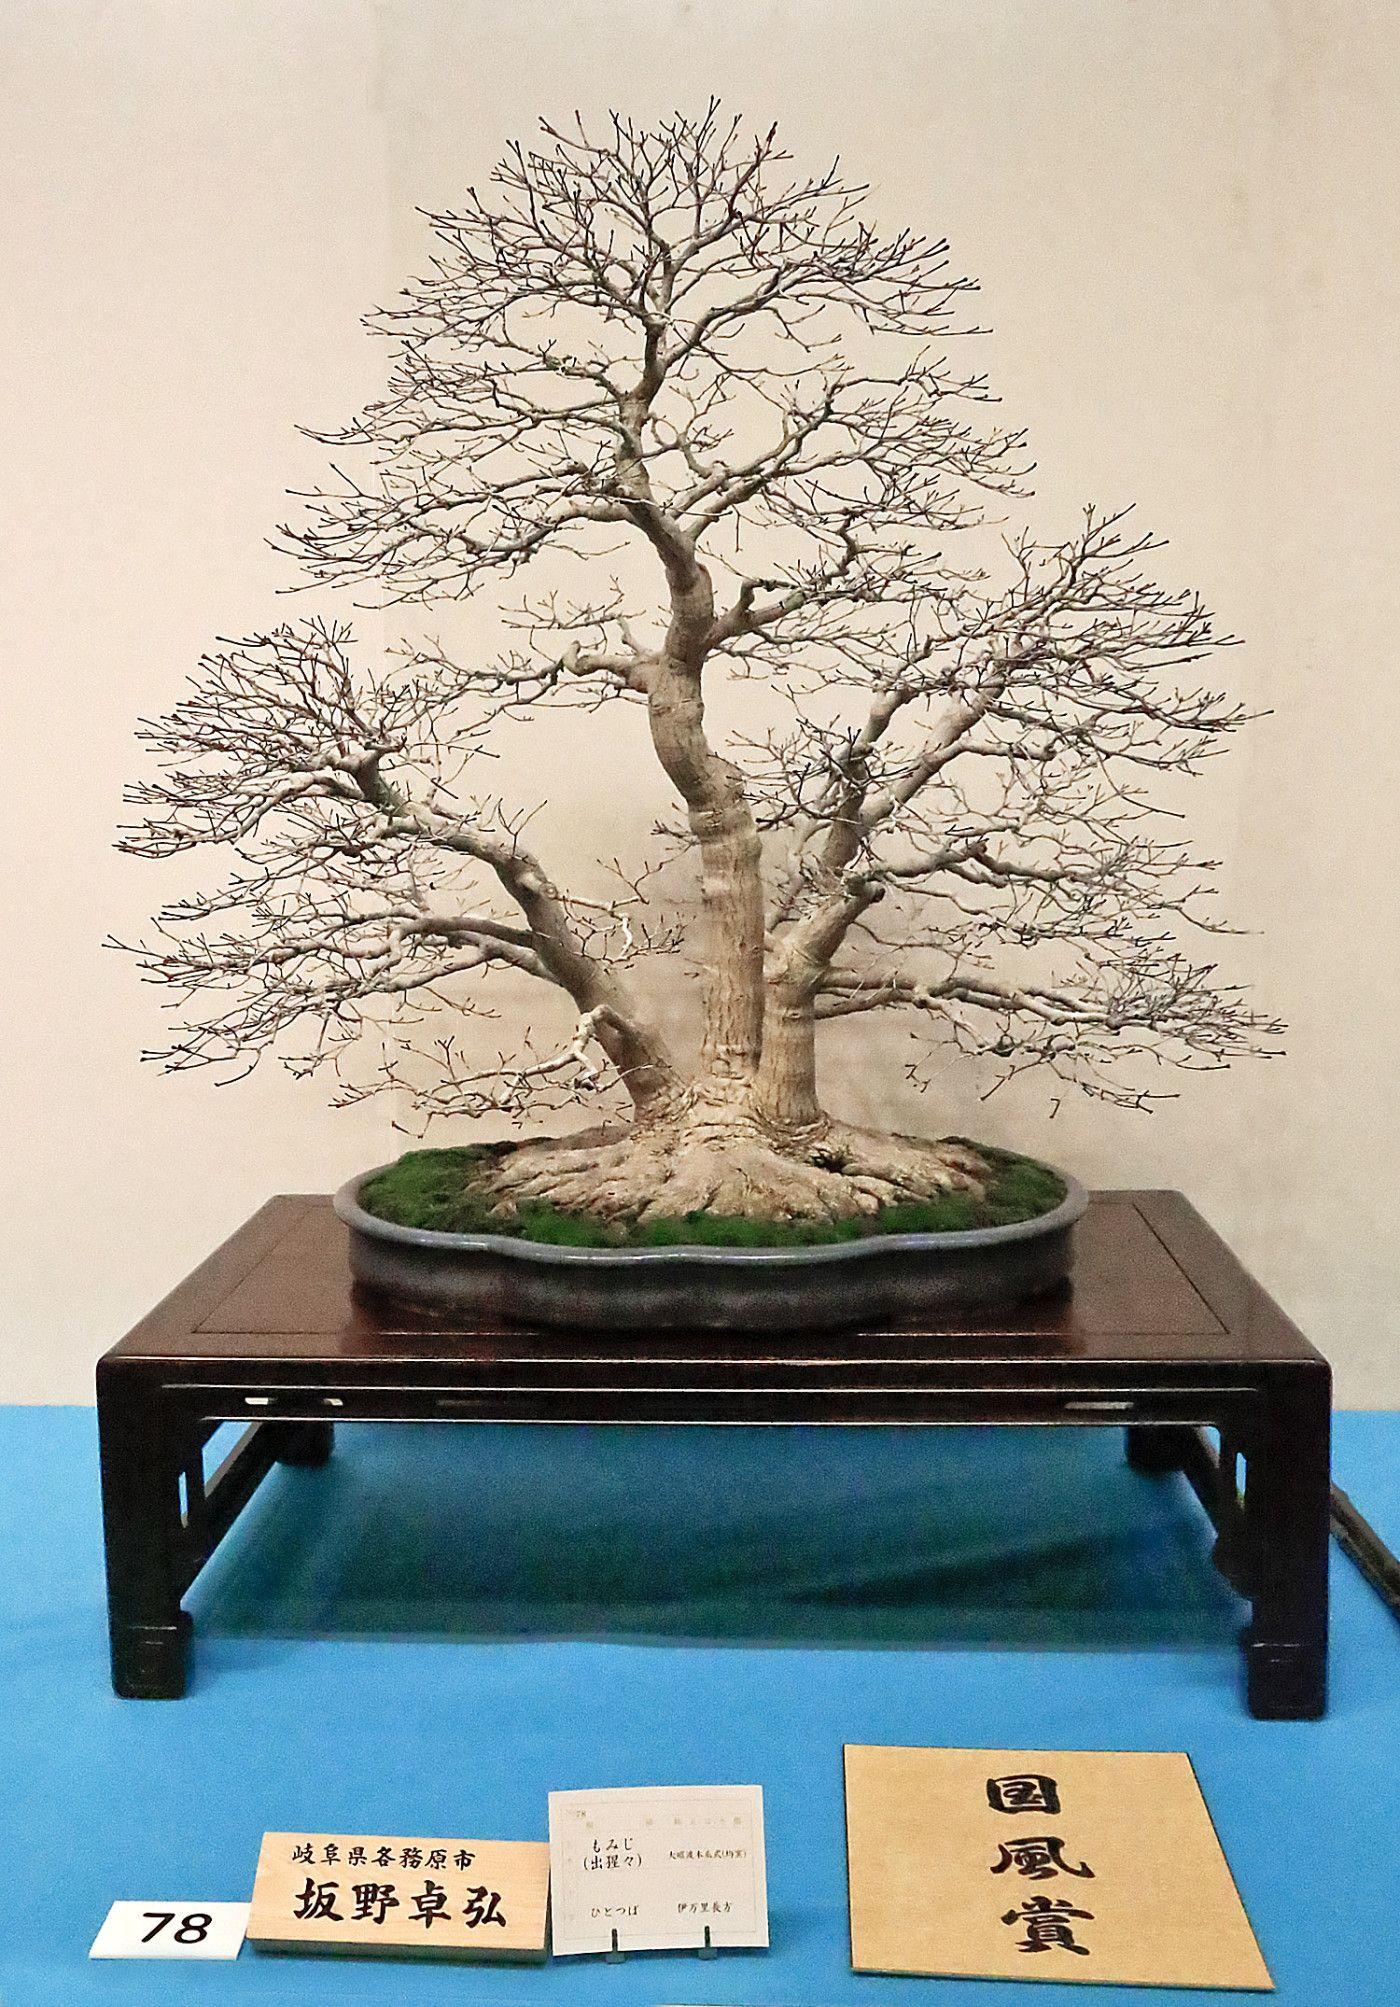 Bonsai. cleary an award-winner. Triple-trunk.